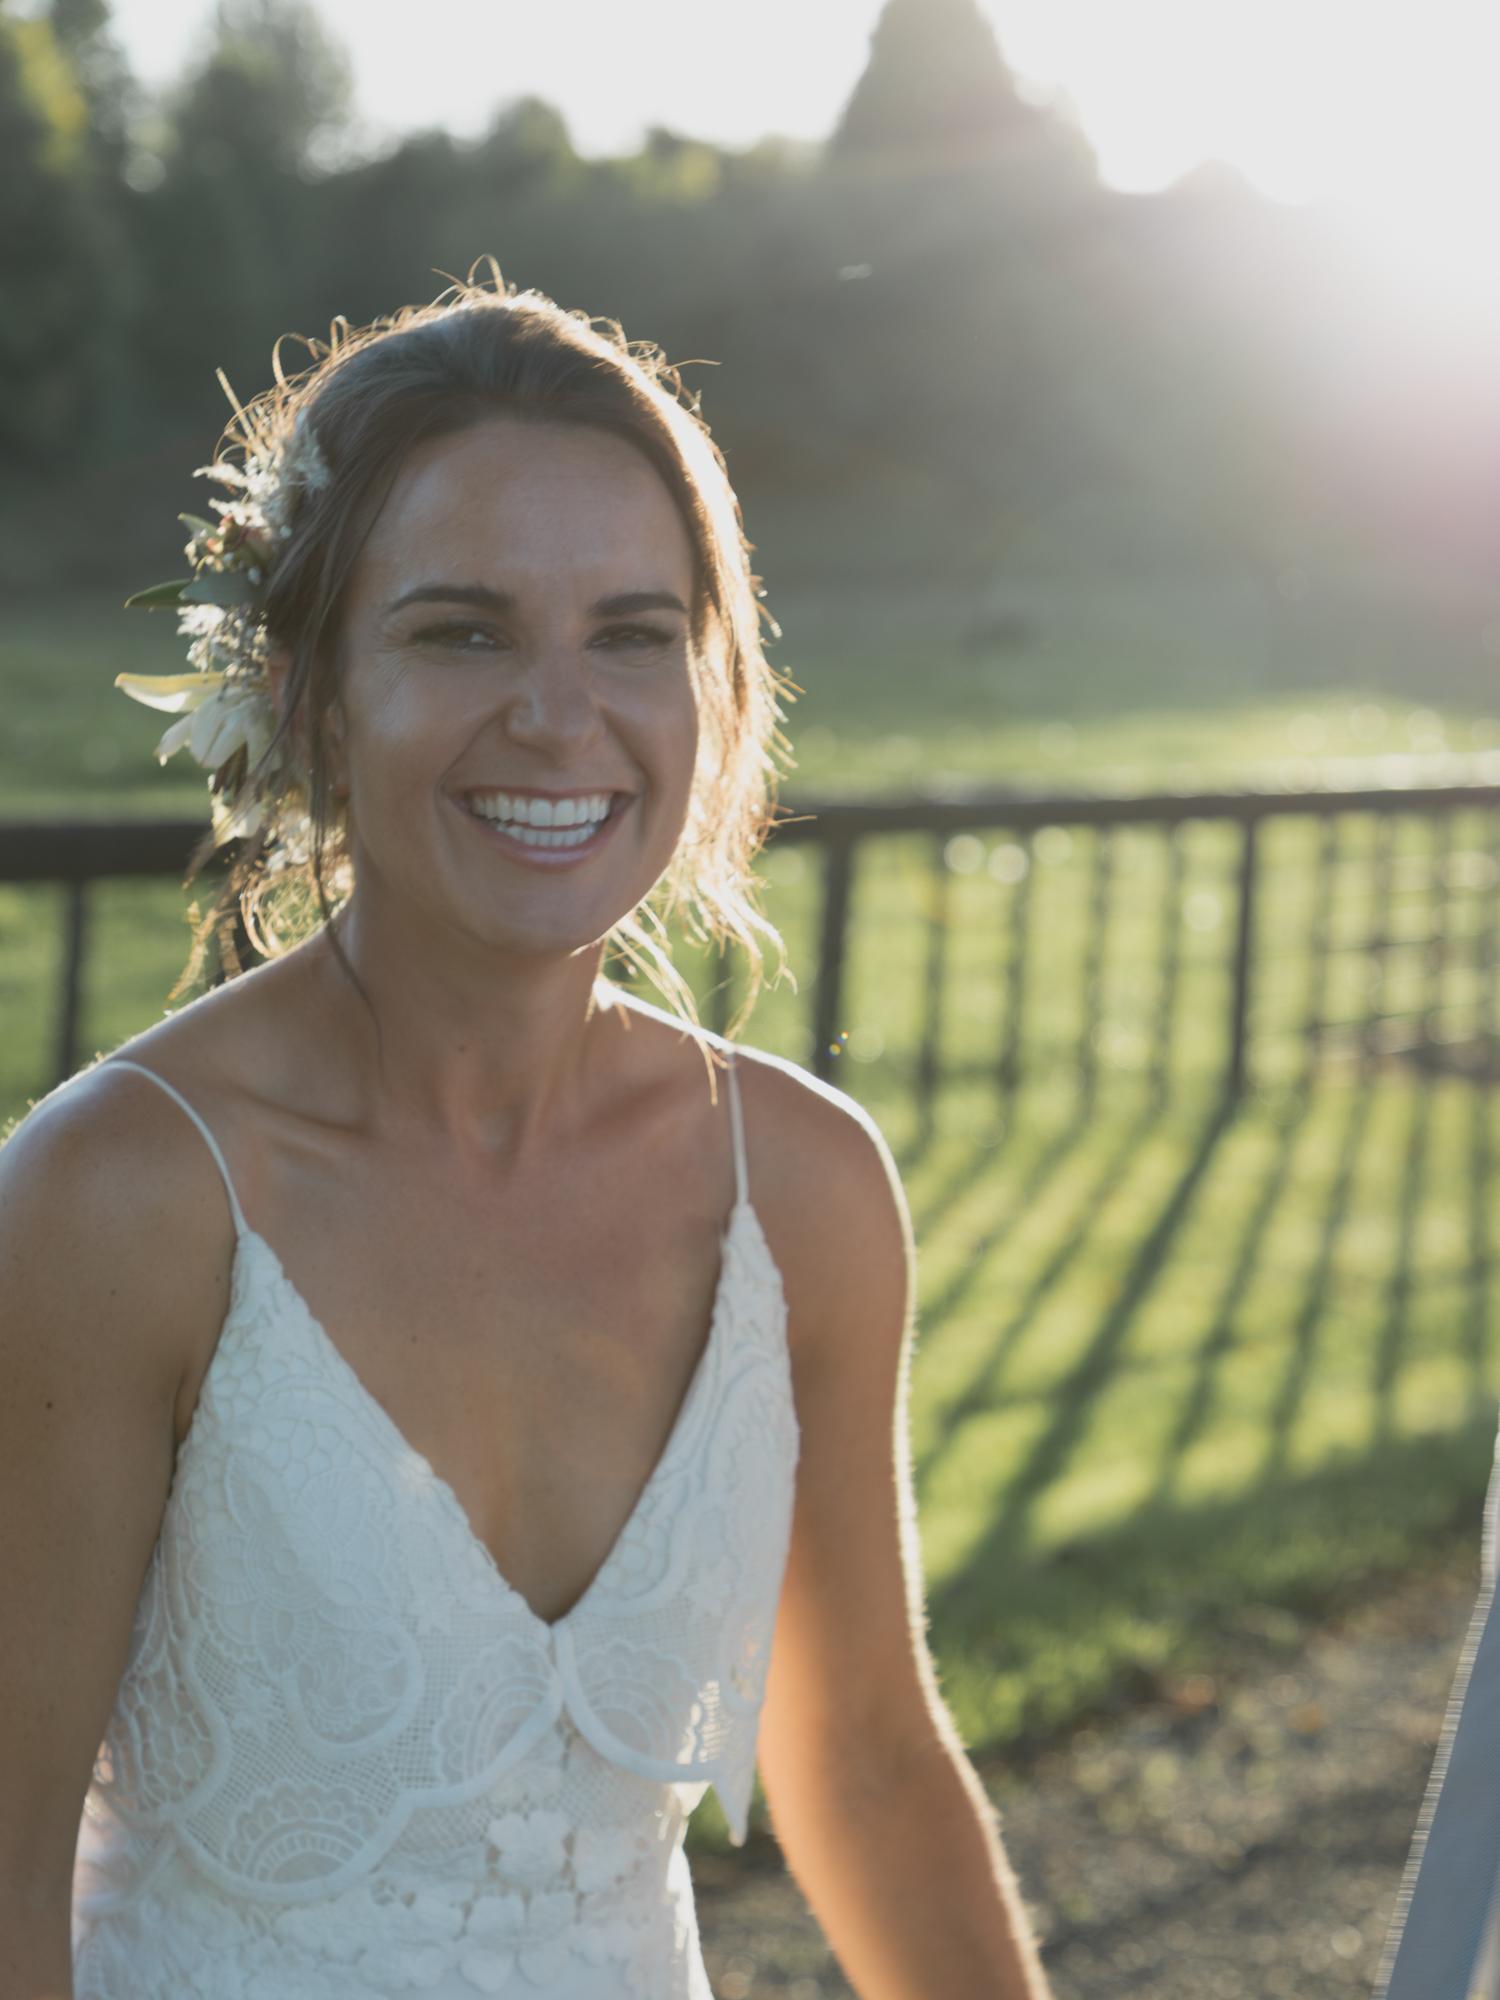 wedding-at-the-red-barn-new-zealand-wedding-photographer-gorgeous-bride.jpg